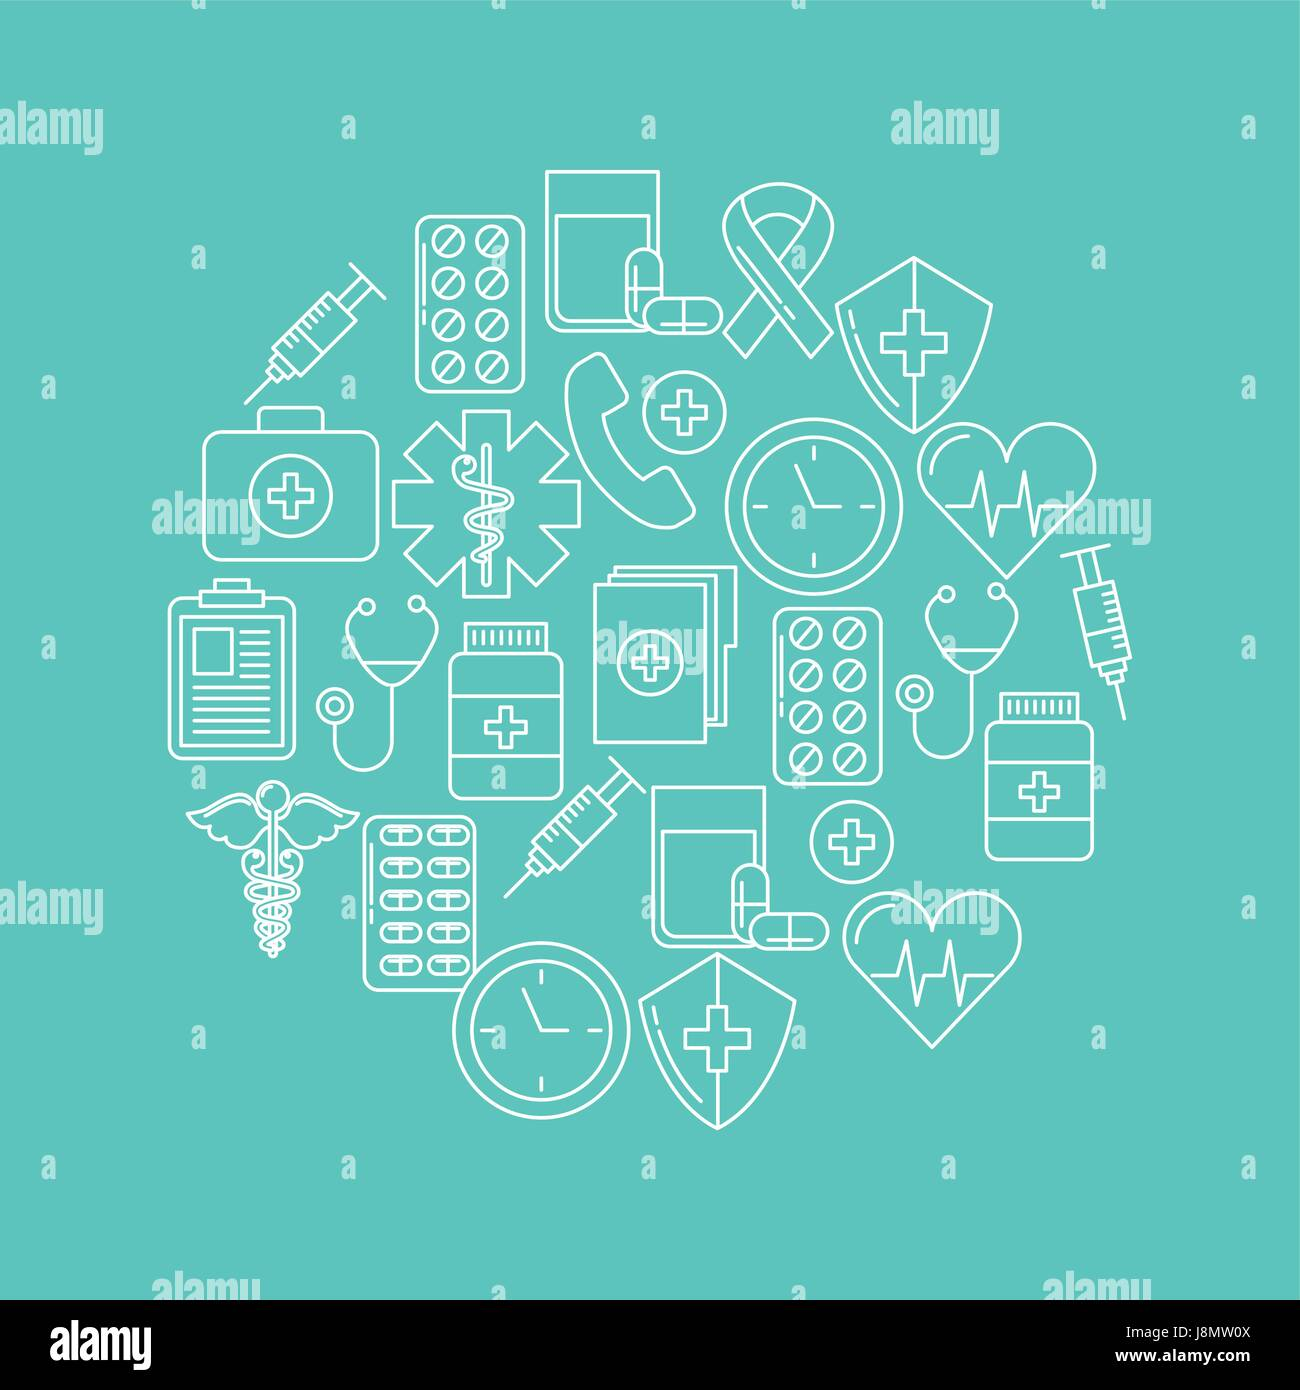 round icon health mind - Stock Image